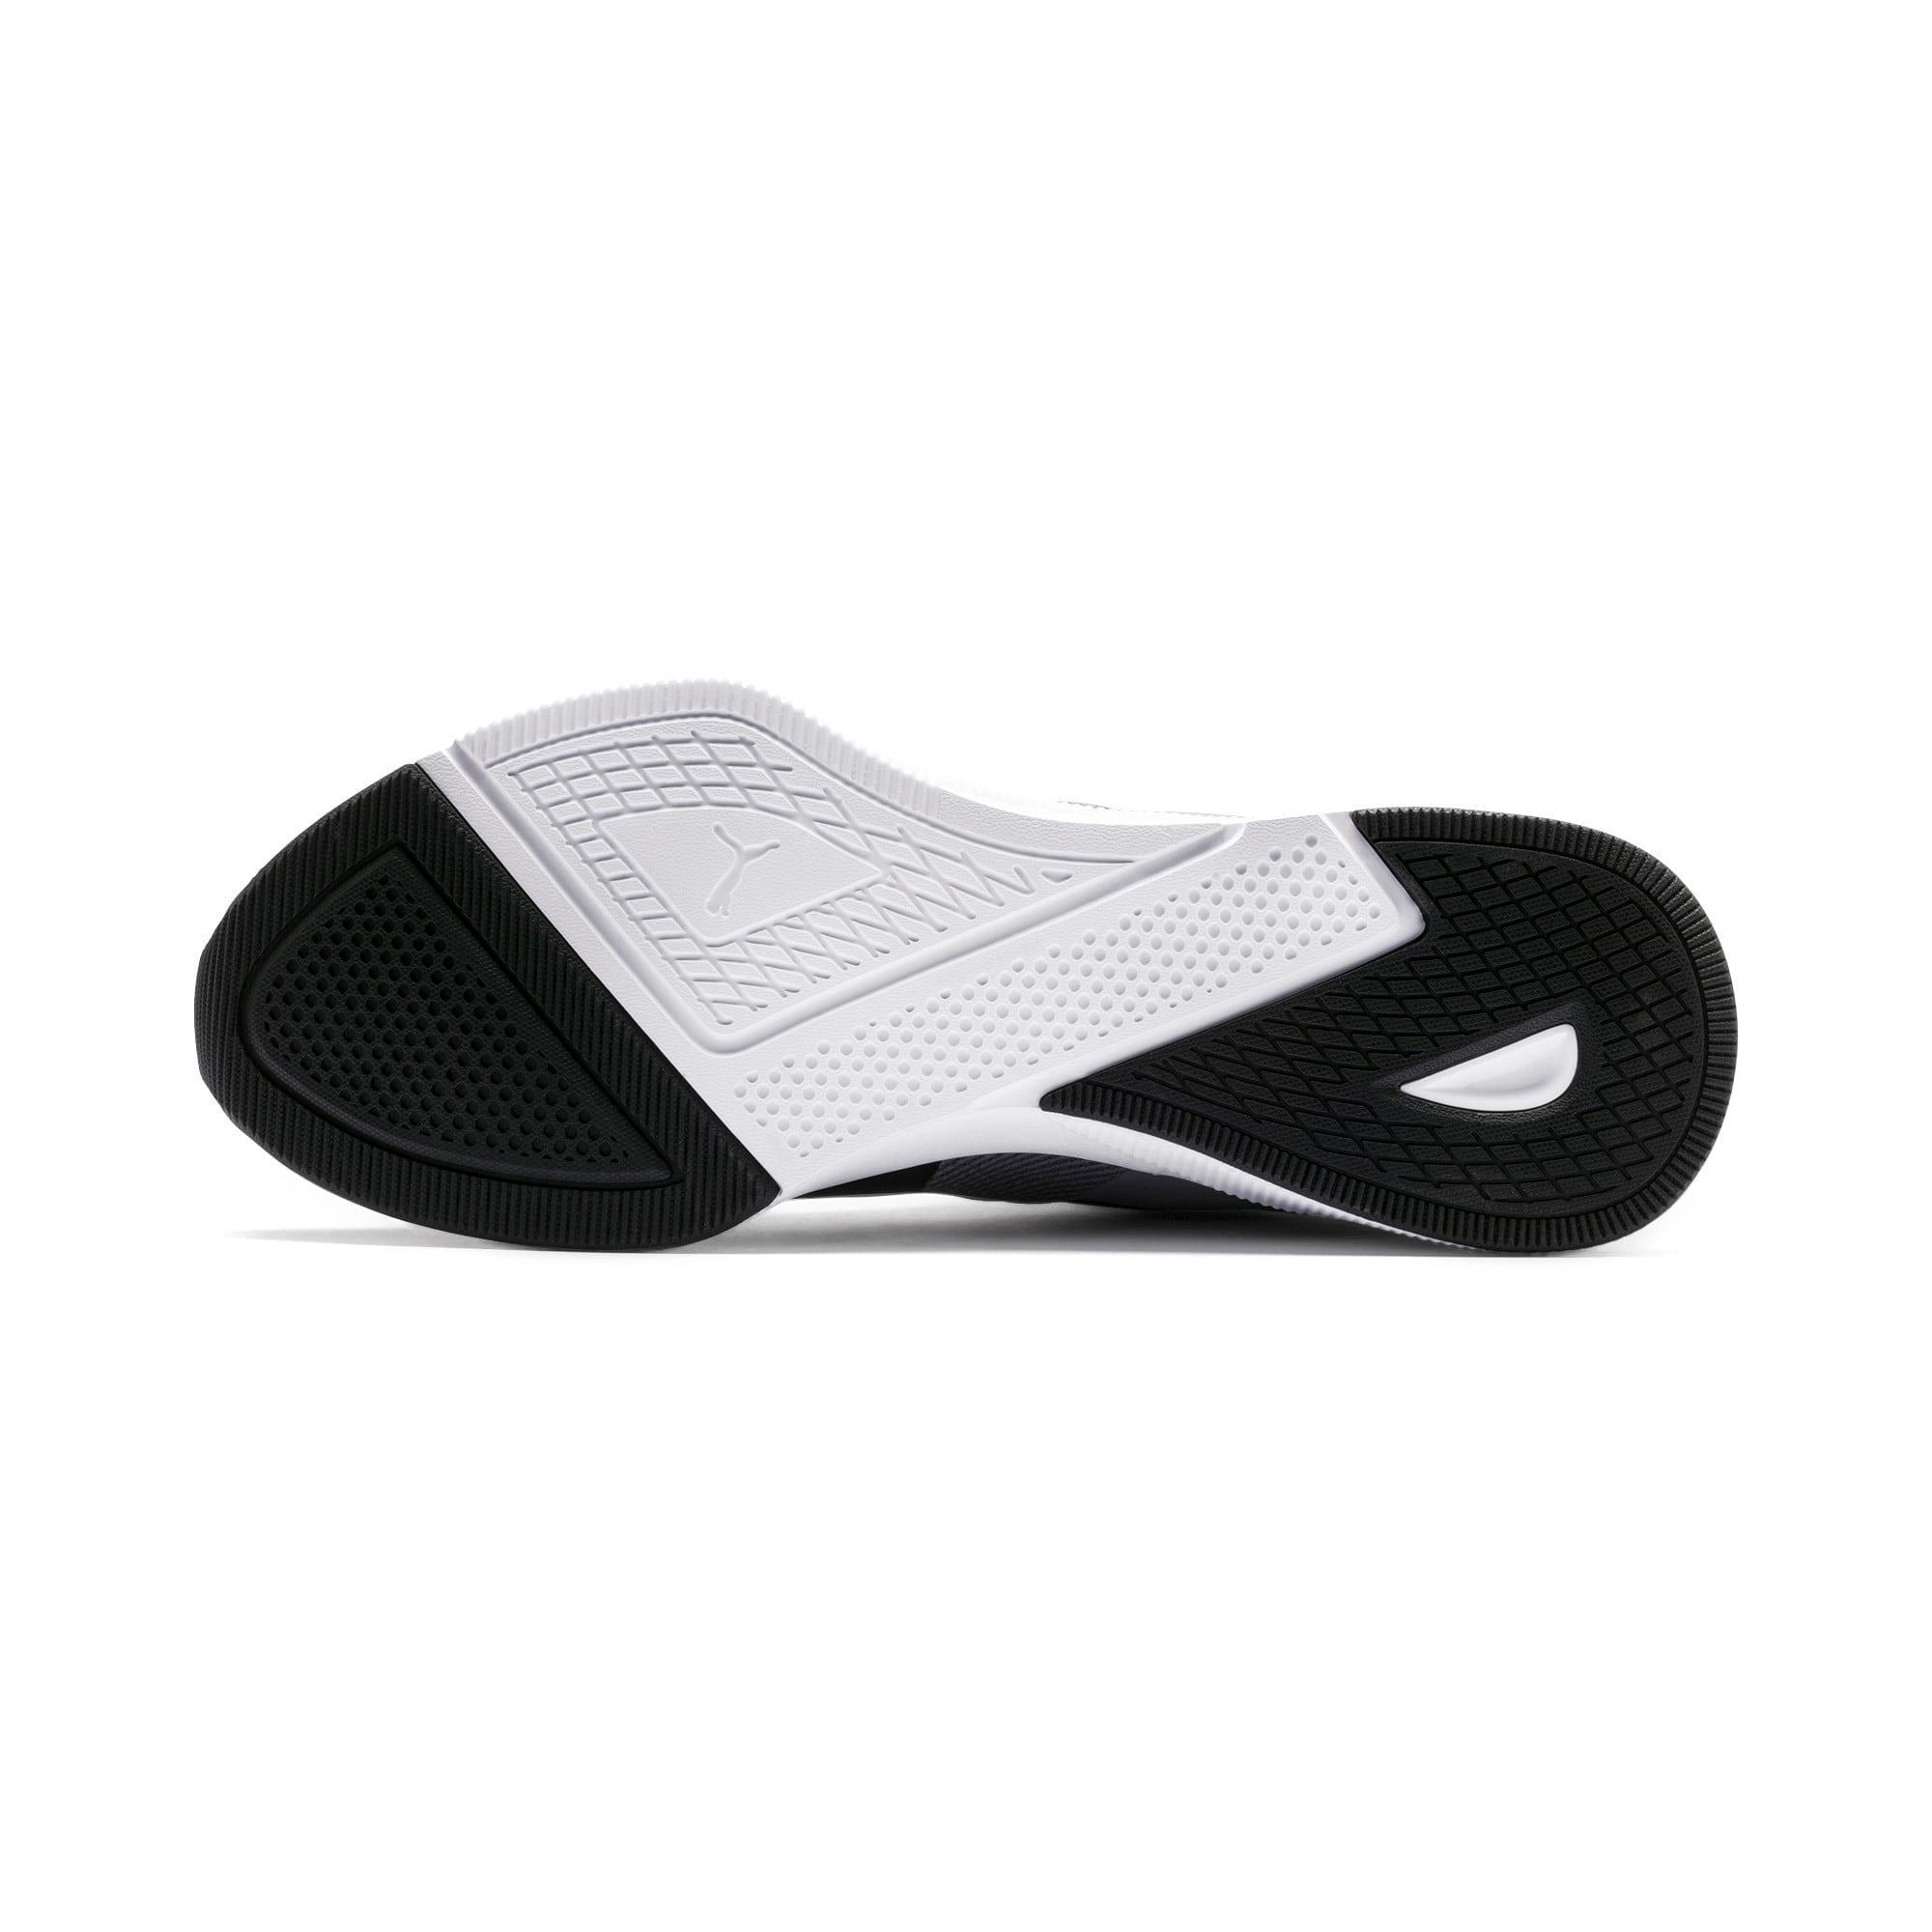 Thumbnail 4 of Flyer Runner Running Shoes, Charcoal-Black-Turquoise, medium